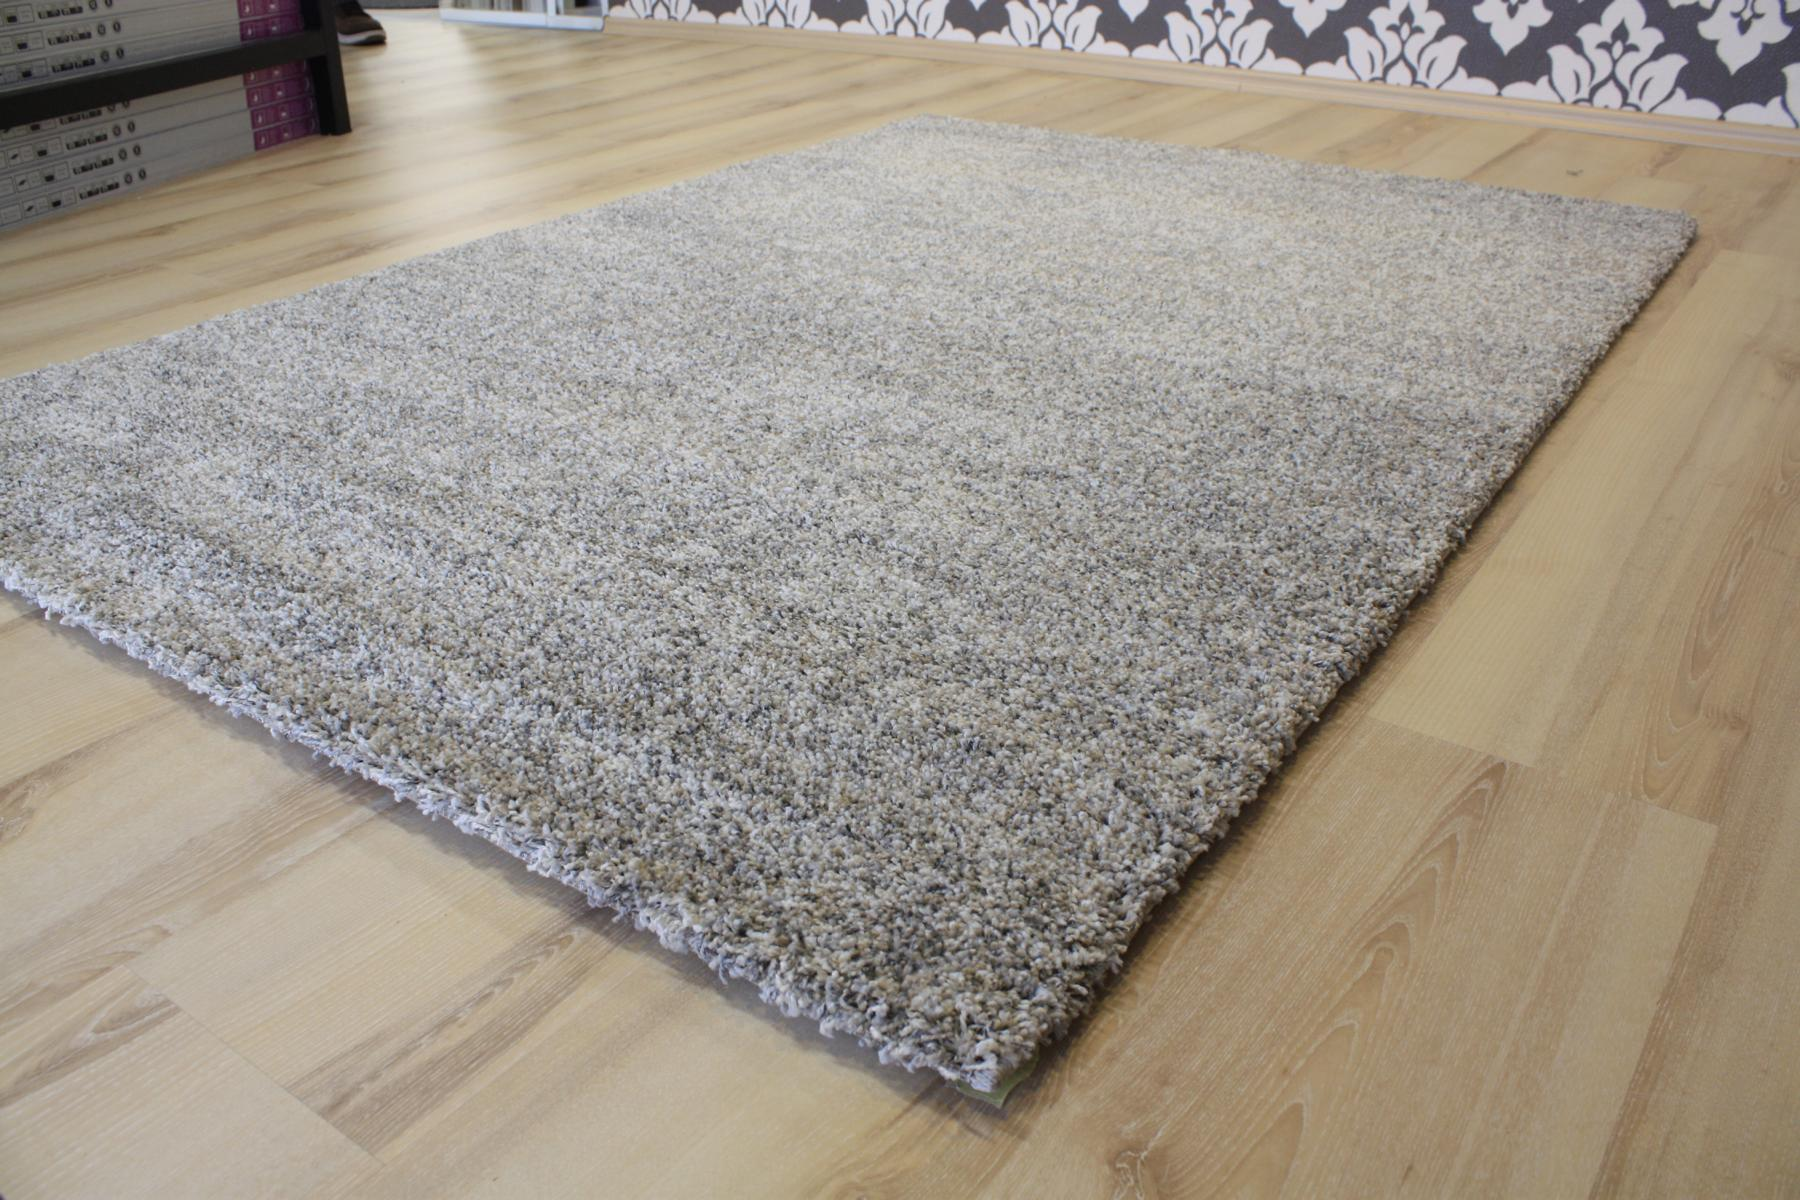 teppich mehari ragolle 23500 uni 6258 grau beige mix 240x340 cm ebay. Black Bedroom Furniture Sets. Home Design Ideas